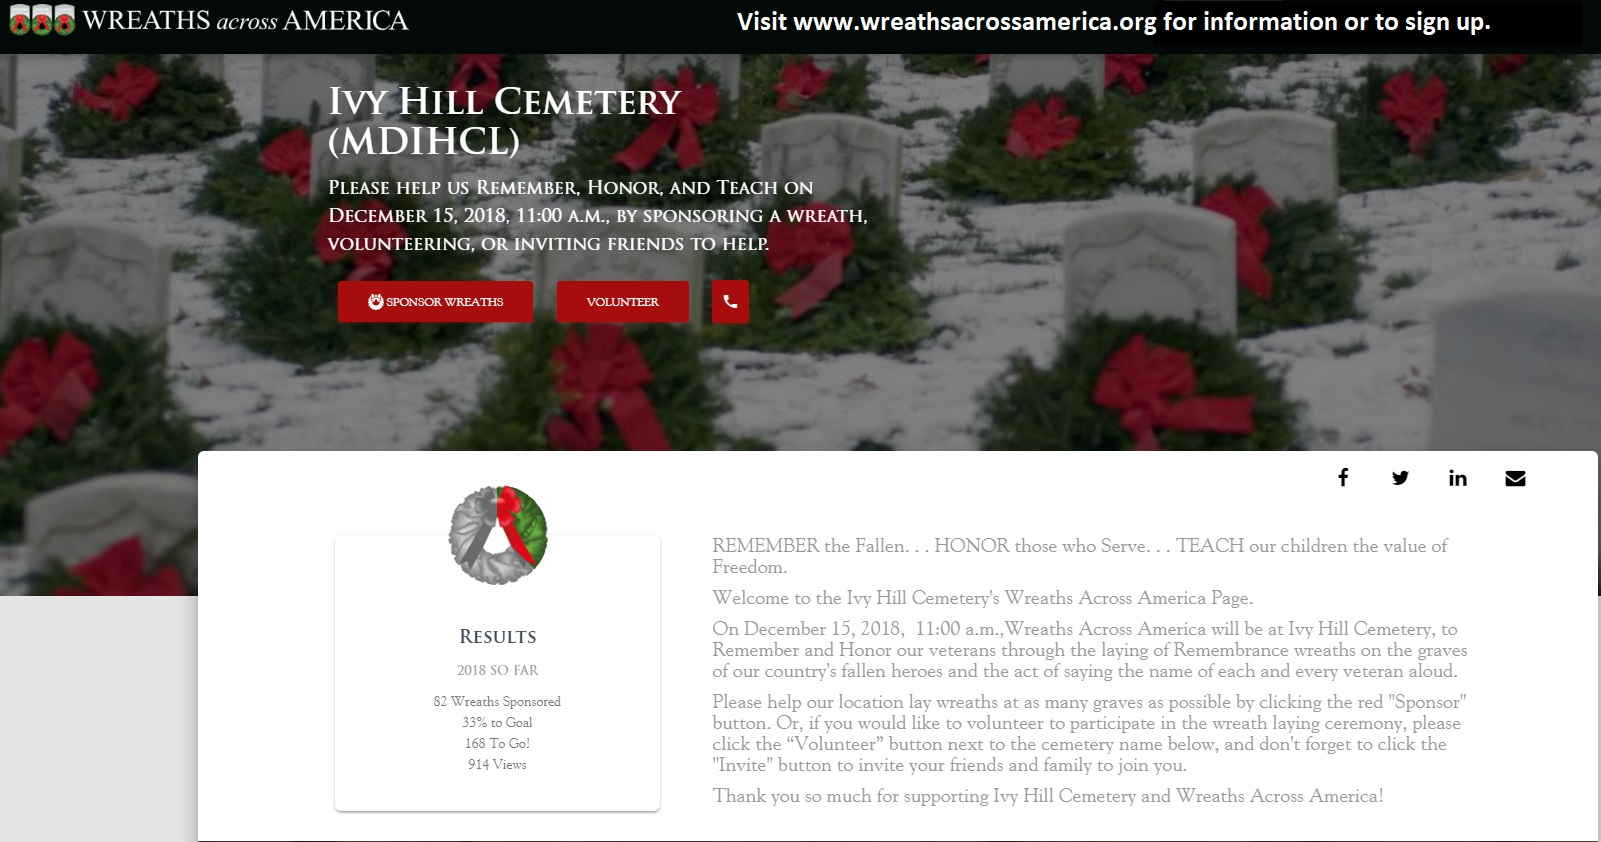 wreaths_across_america.jpg